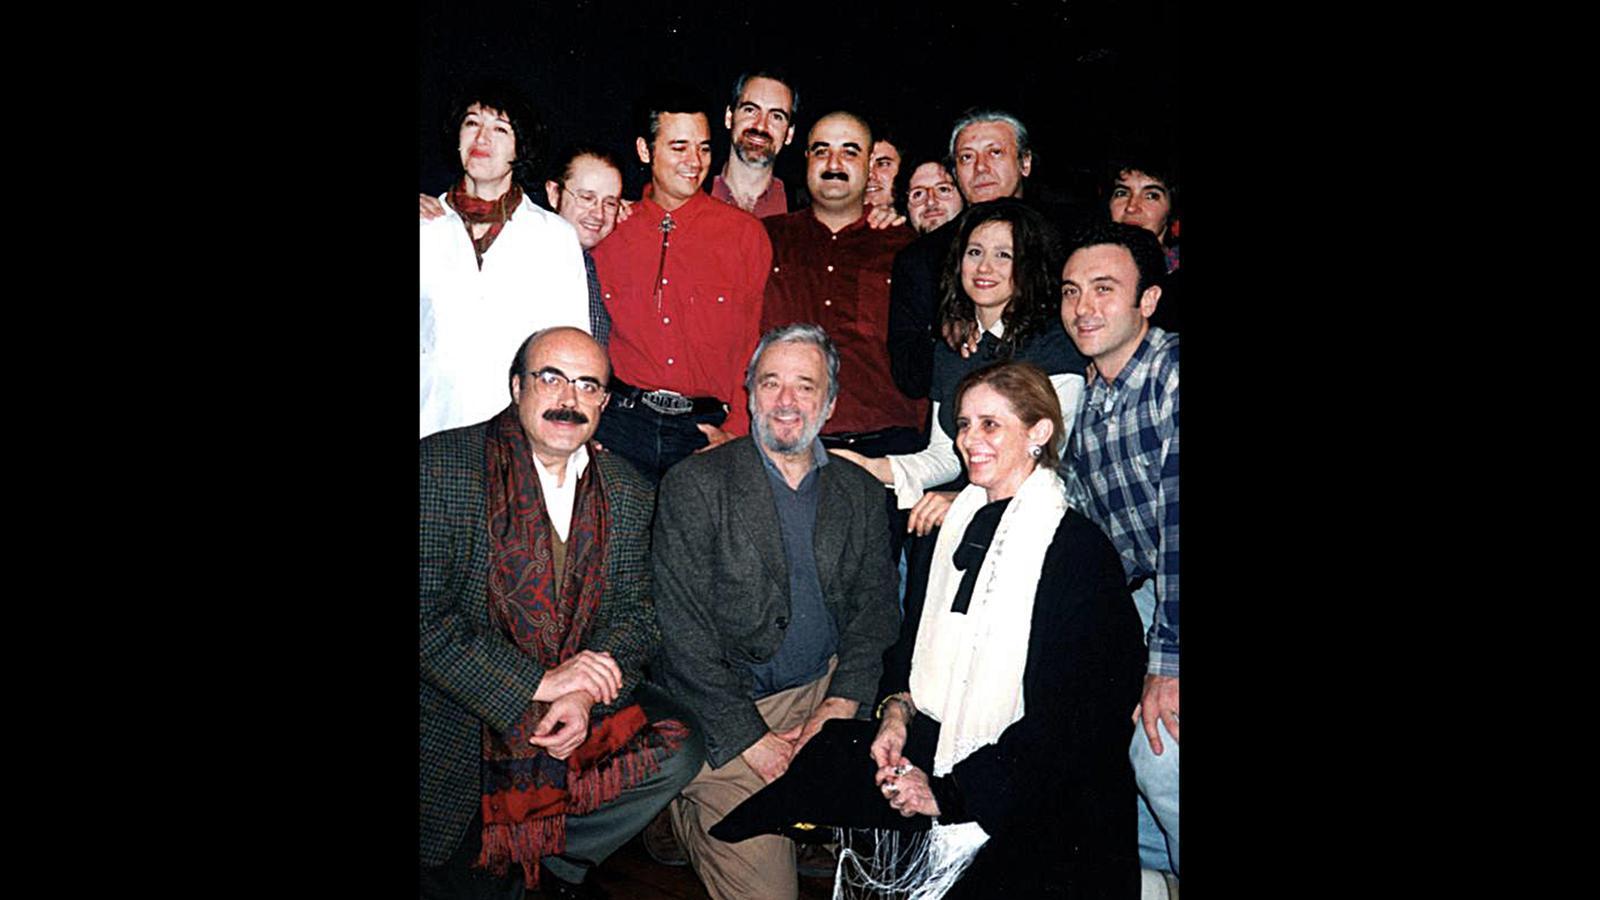 L'equip de 'Sweeney Todd' amb el compositor Stephen Sondheim